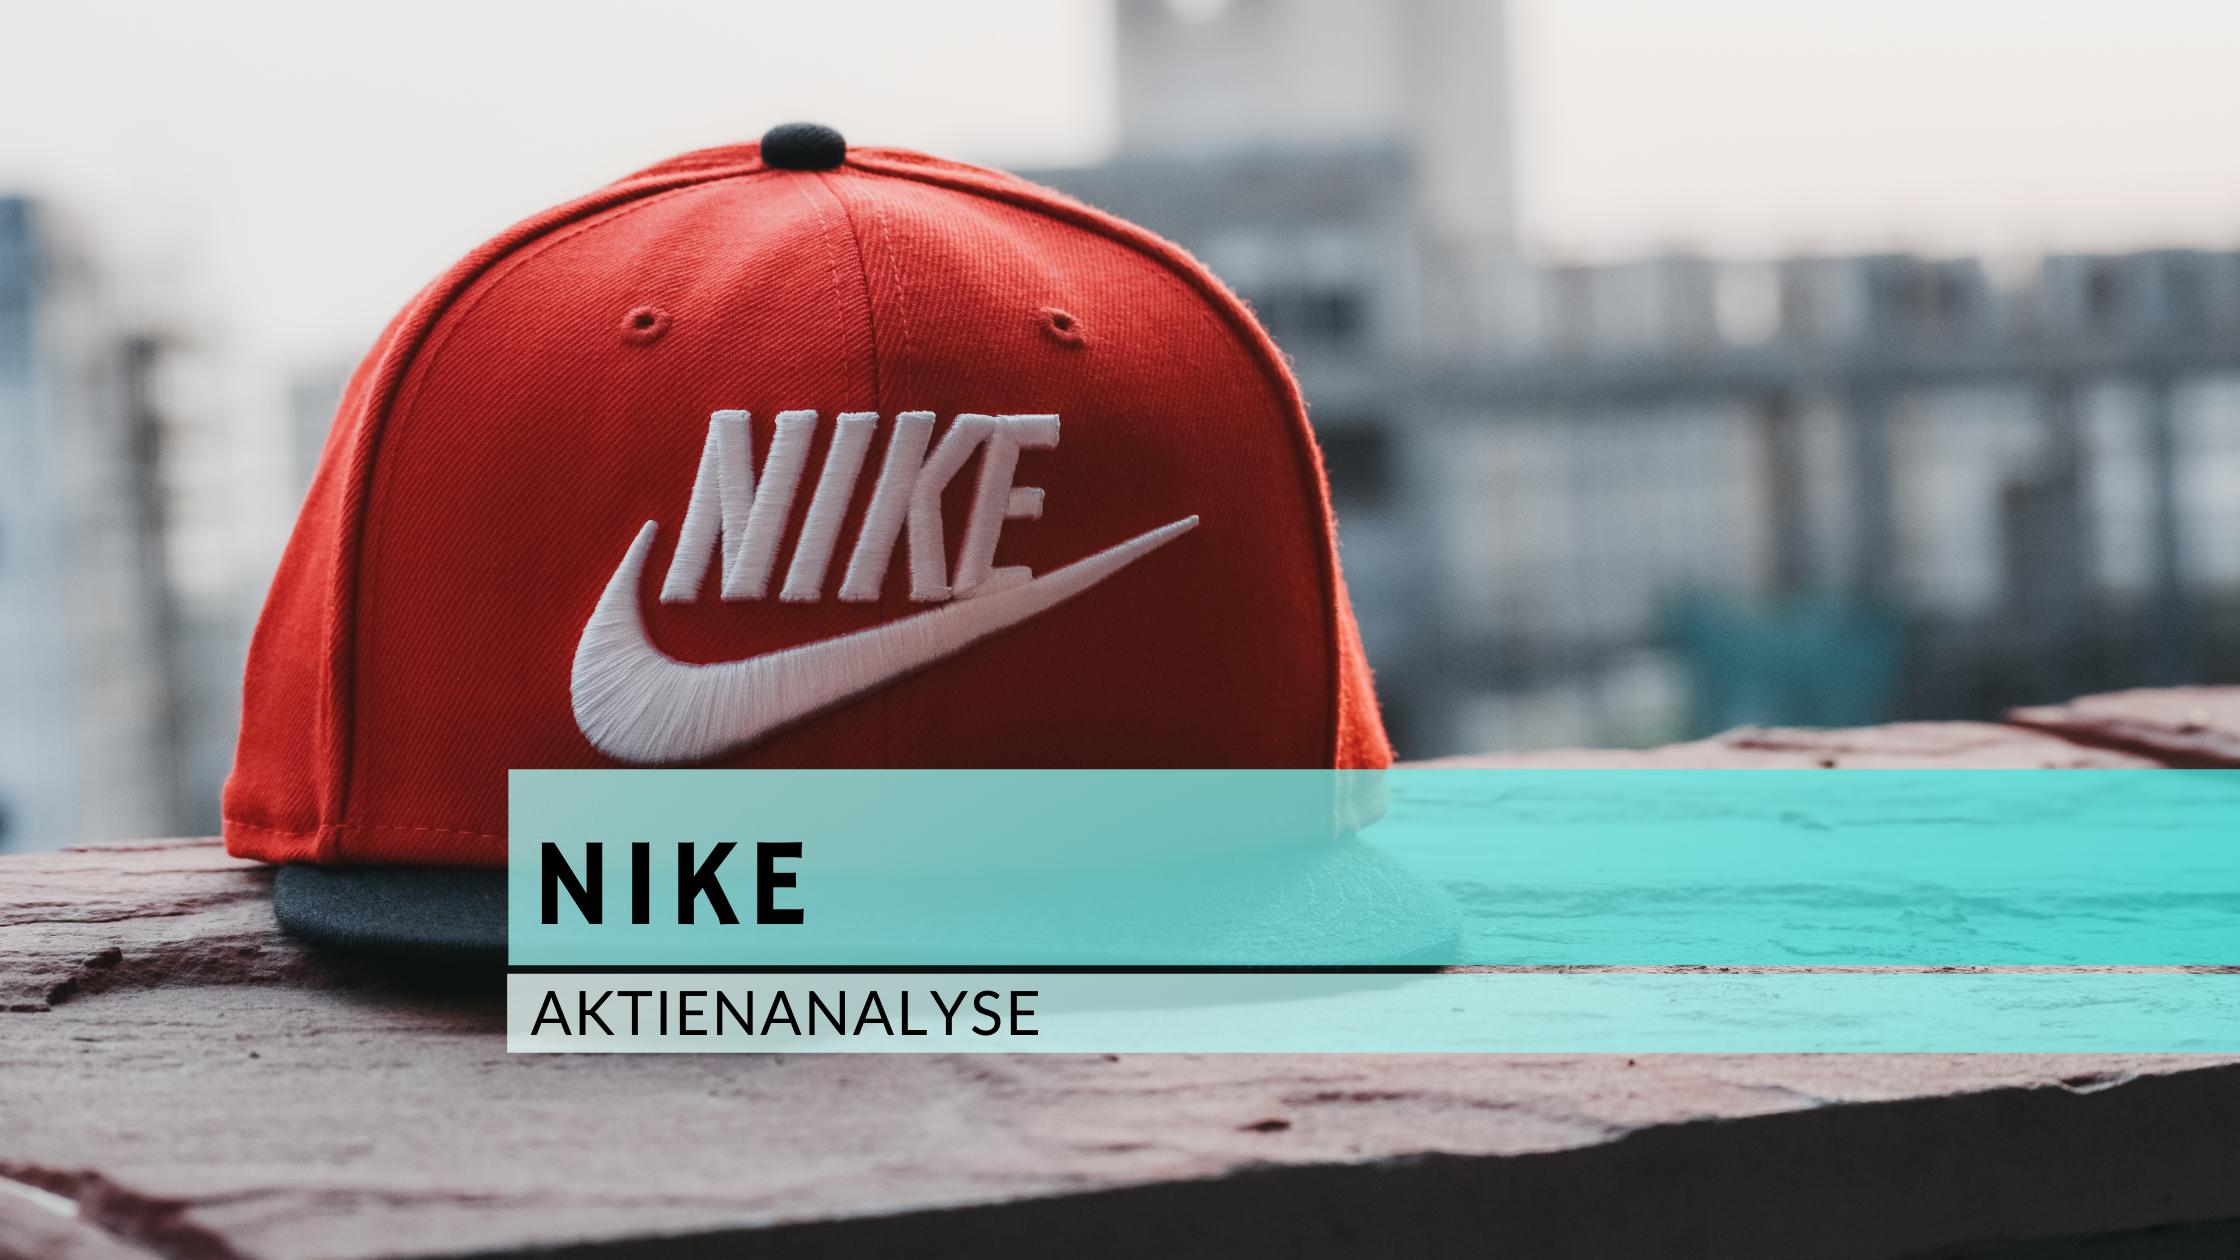 Nike Aktienanalyse